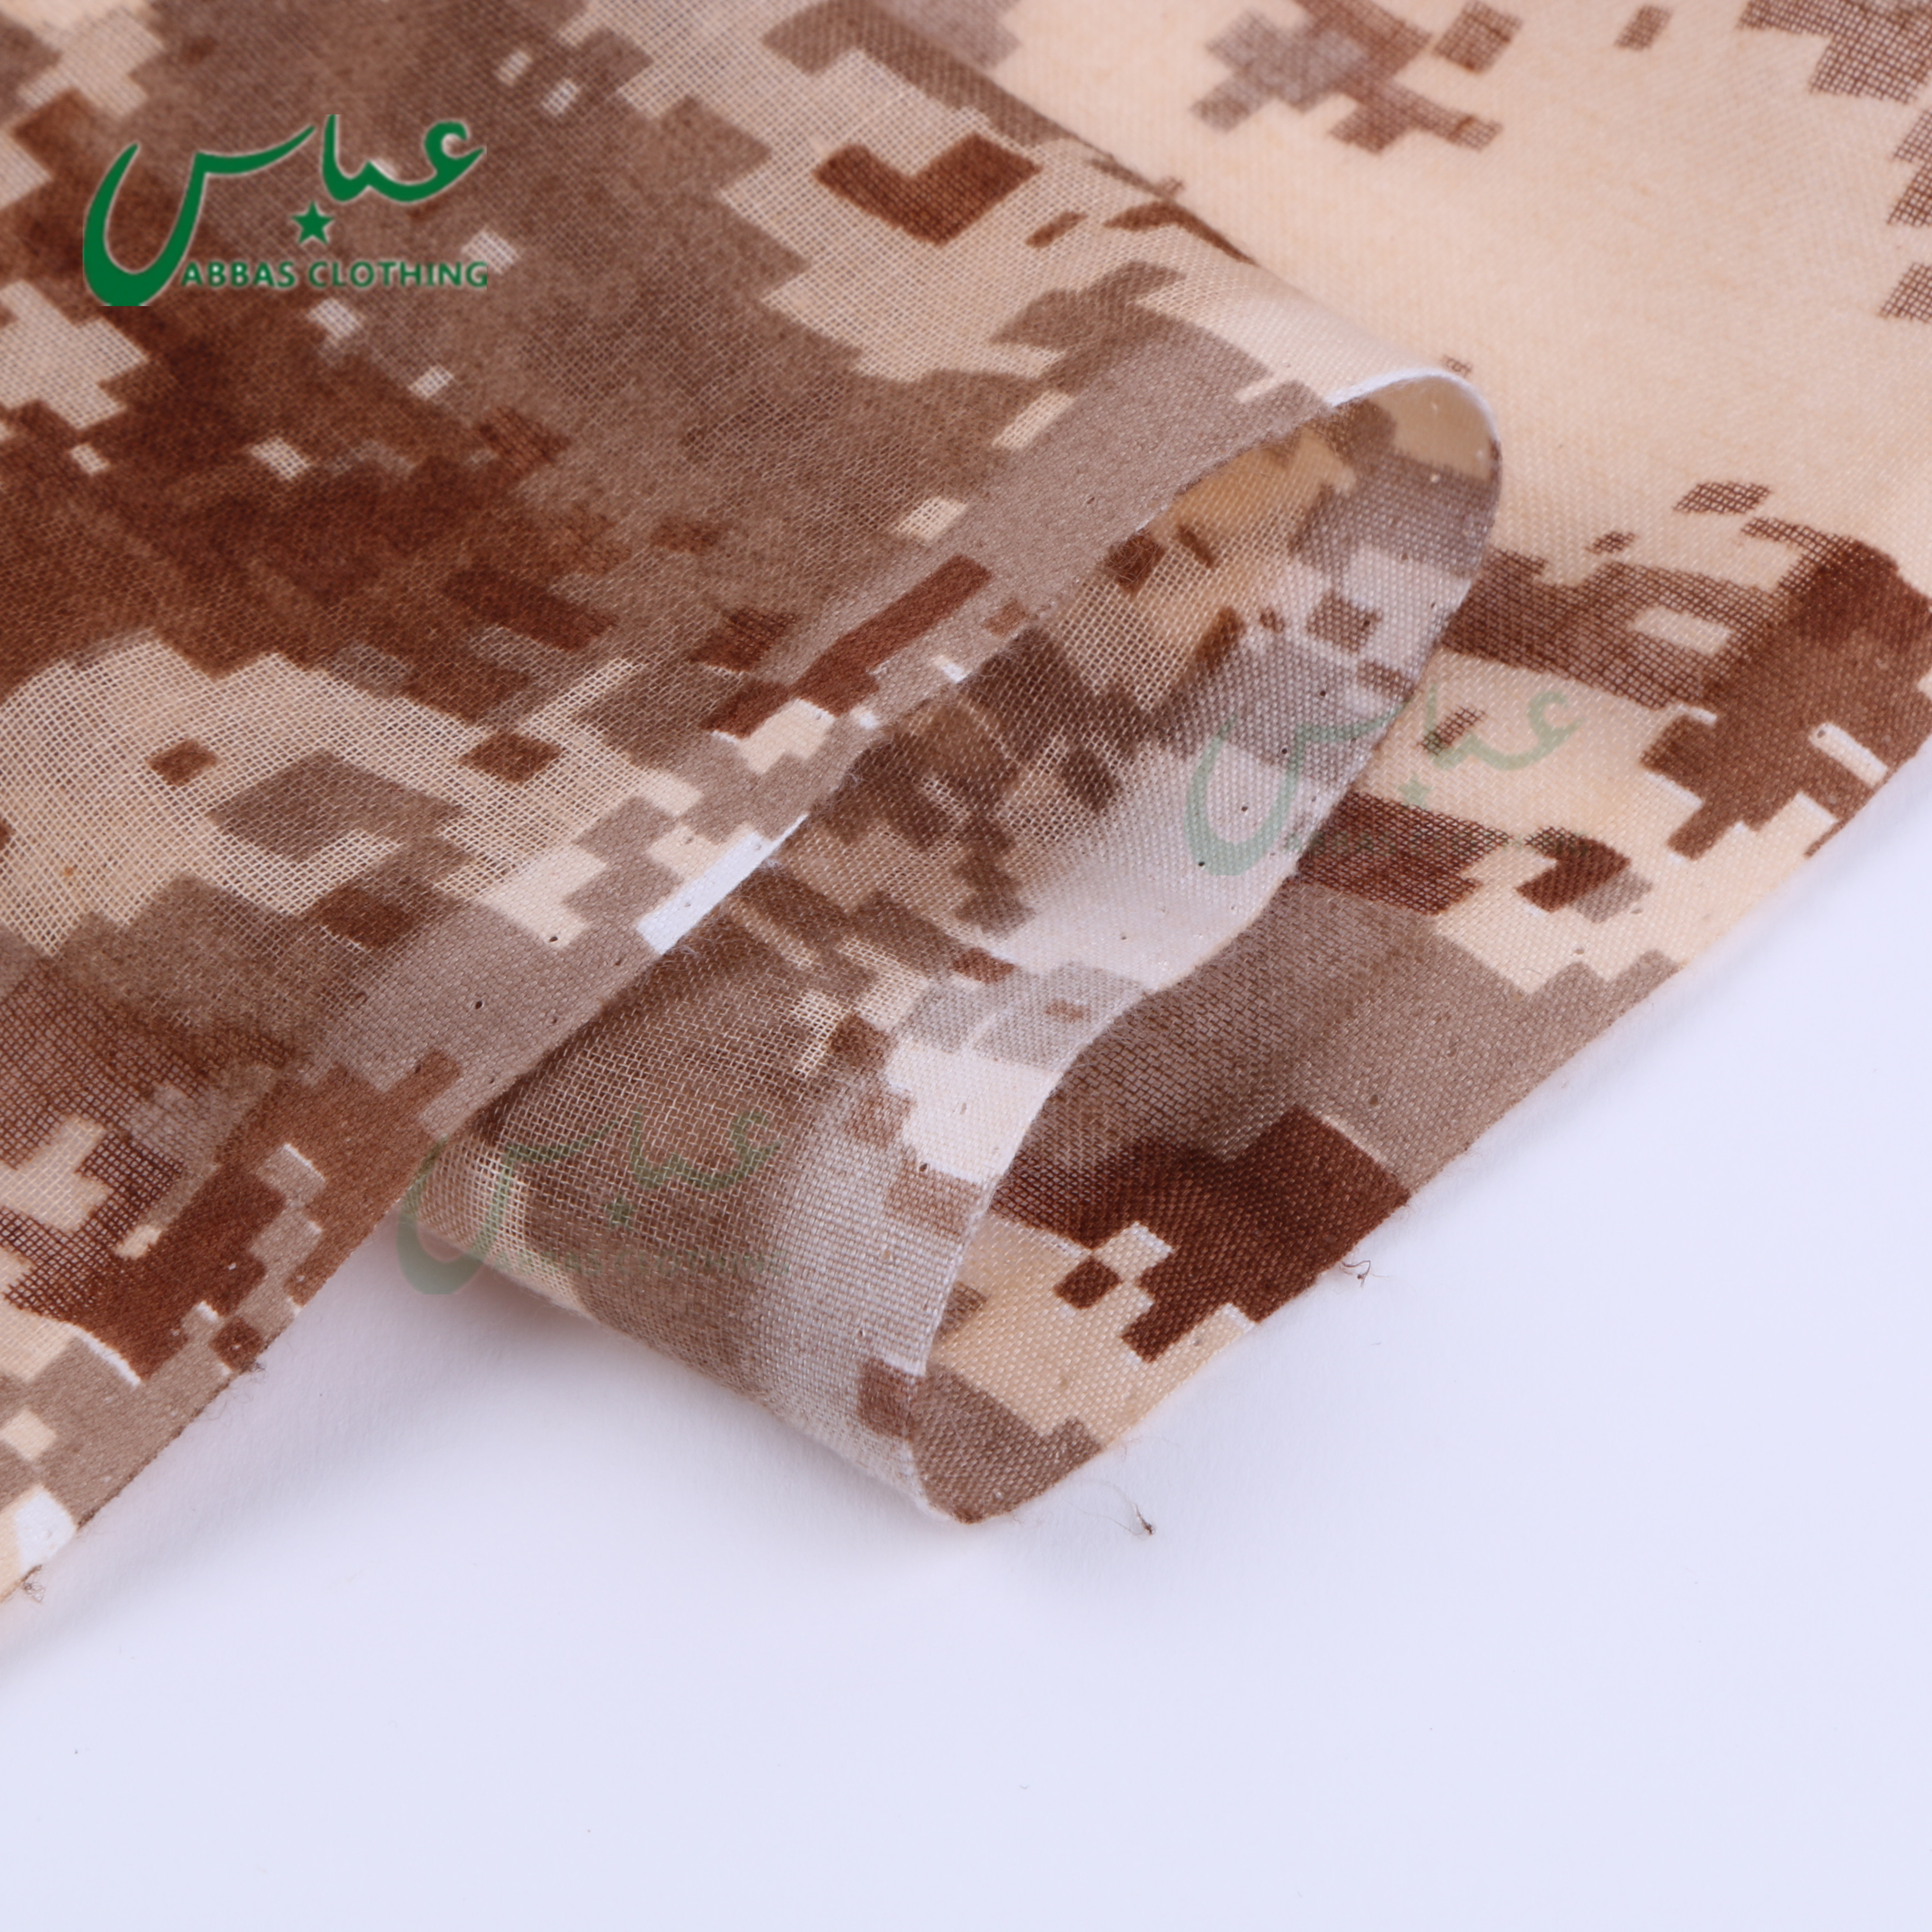 2019 New Military Shemagh  Desert 100% Polyester Keffiyeh Scarf Wrap